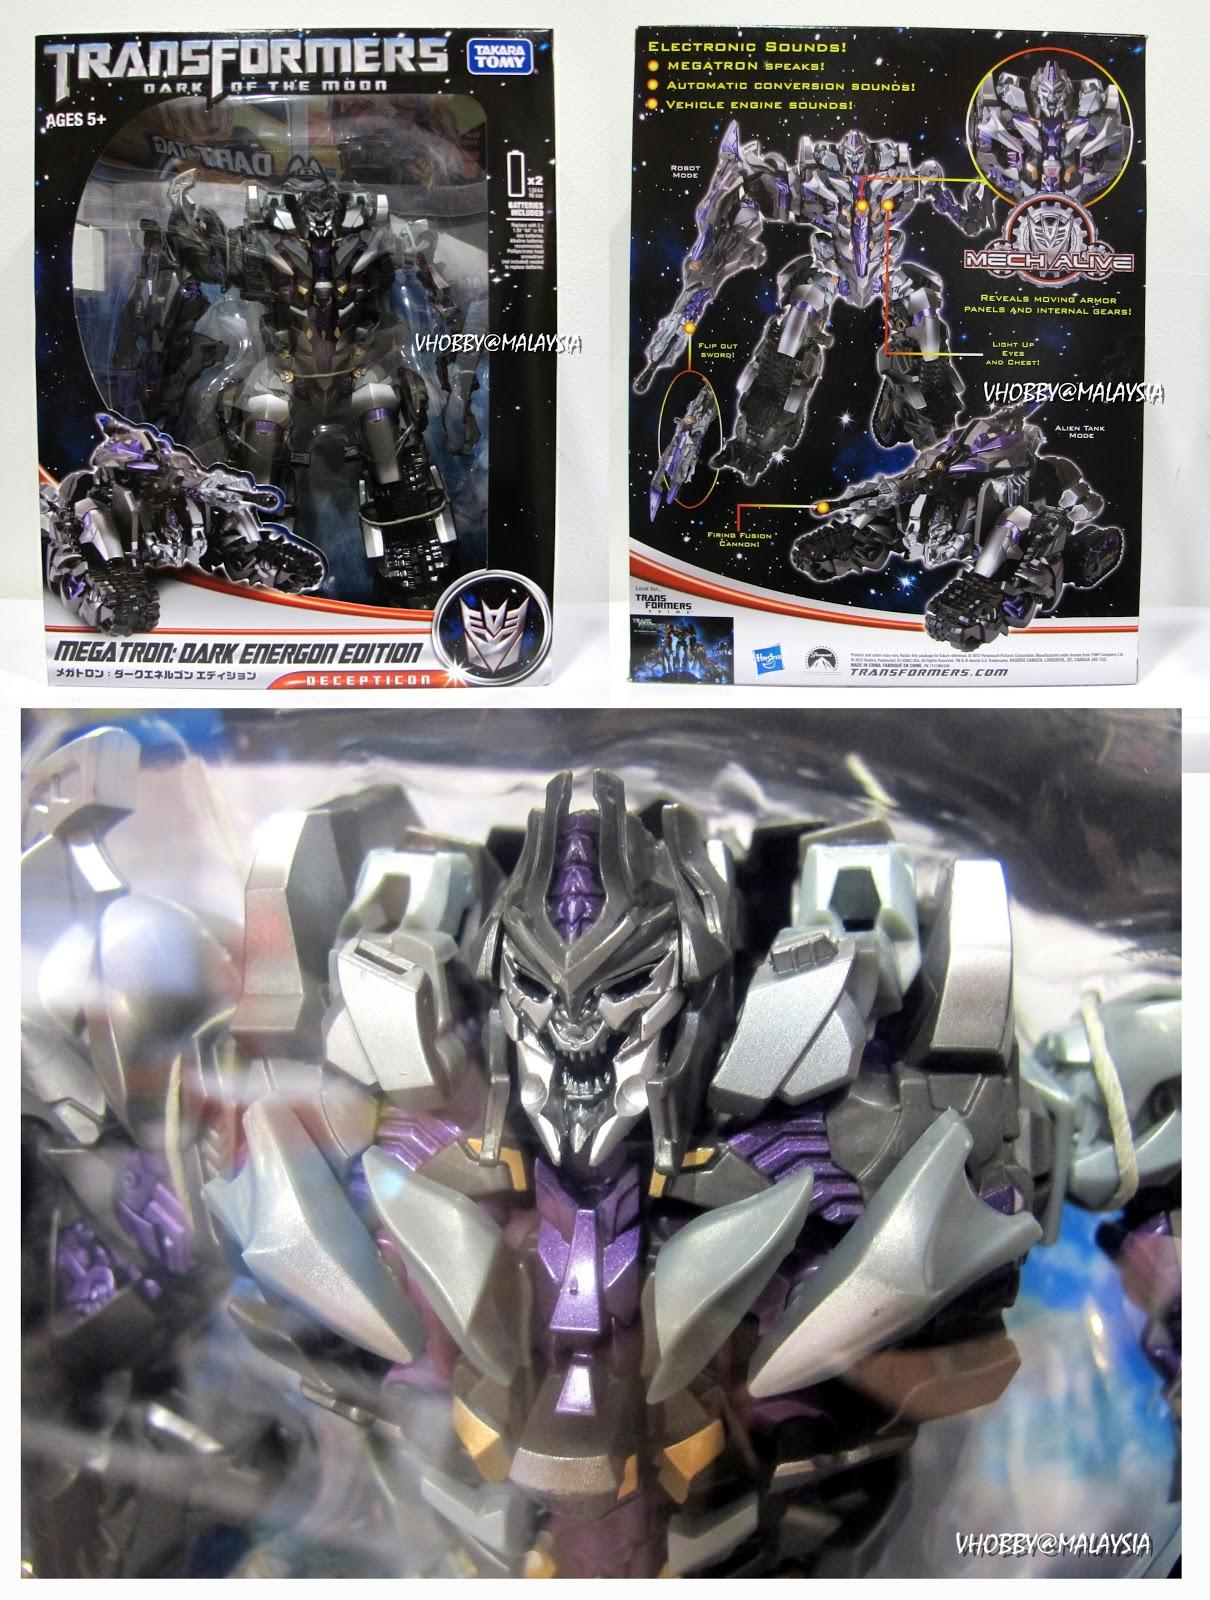 Transformers Dotm Leader Class Megatron Leader Class Megatron Dark